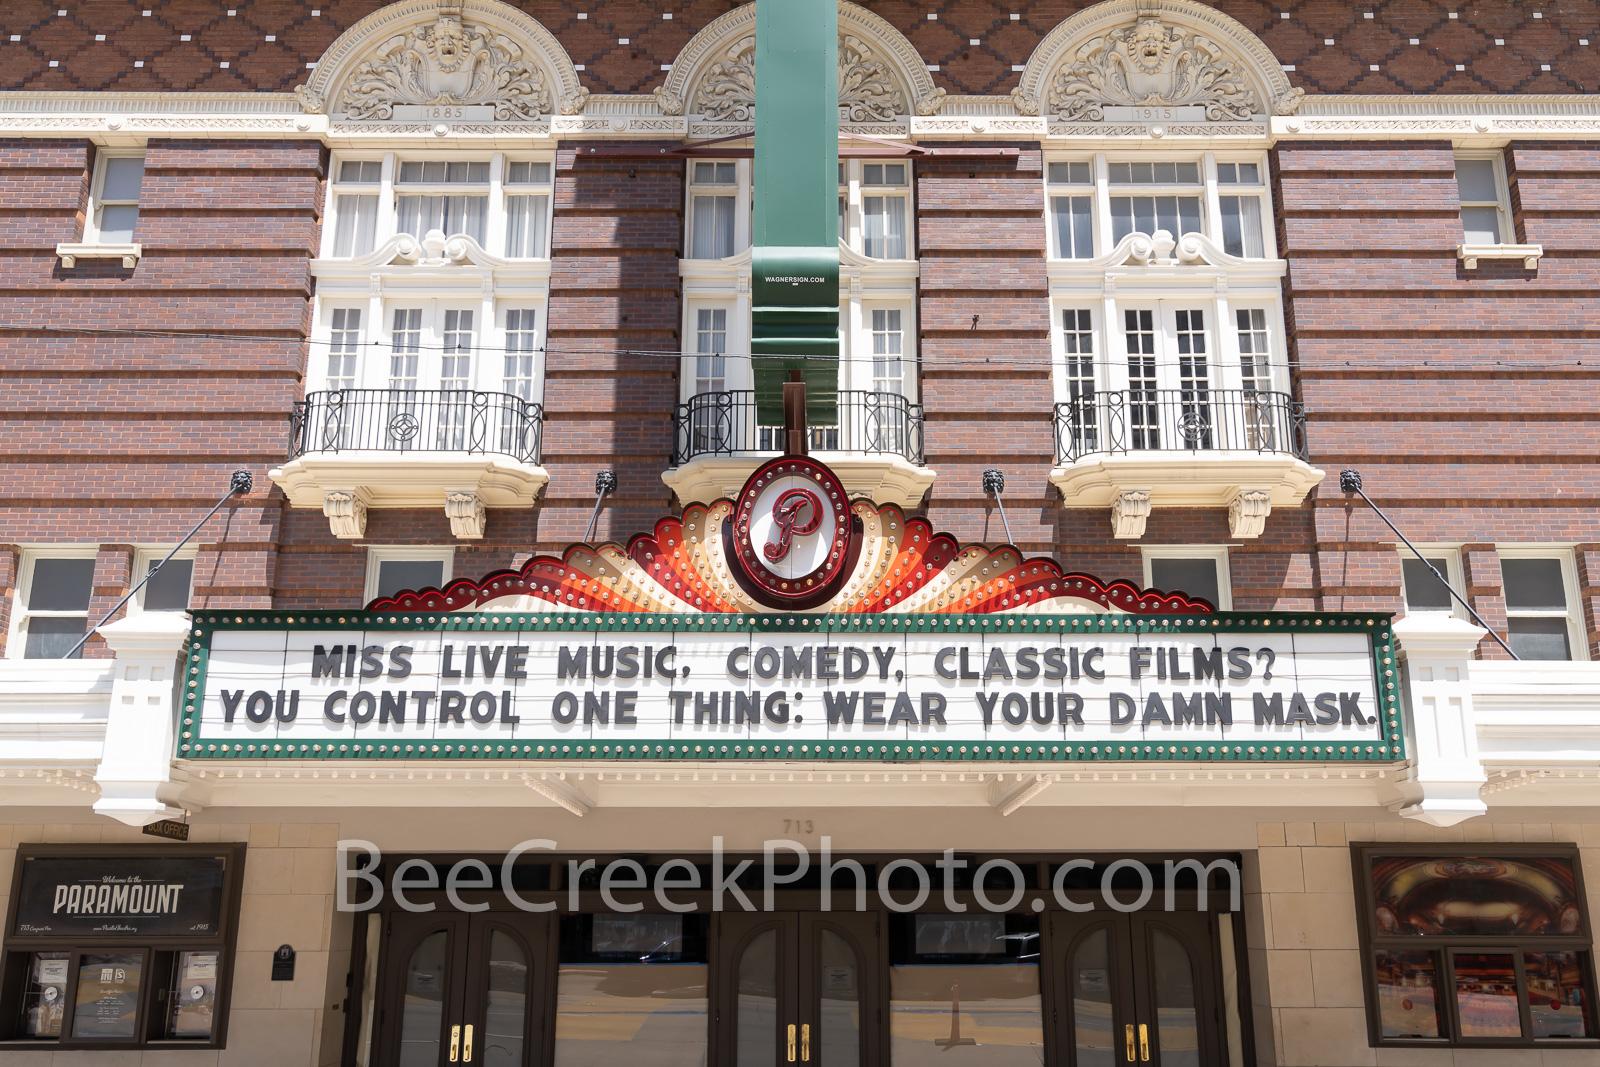 austin texas, paramount theatre, paramount theatre marquee, sign, marquee, theater, austin, texas, movie theater, downtown austin, austin texas, landmark, austin landmark, national register of histori, photo